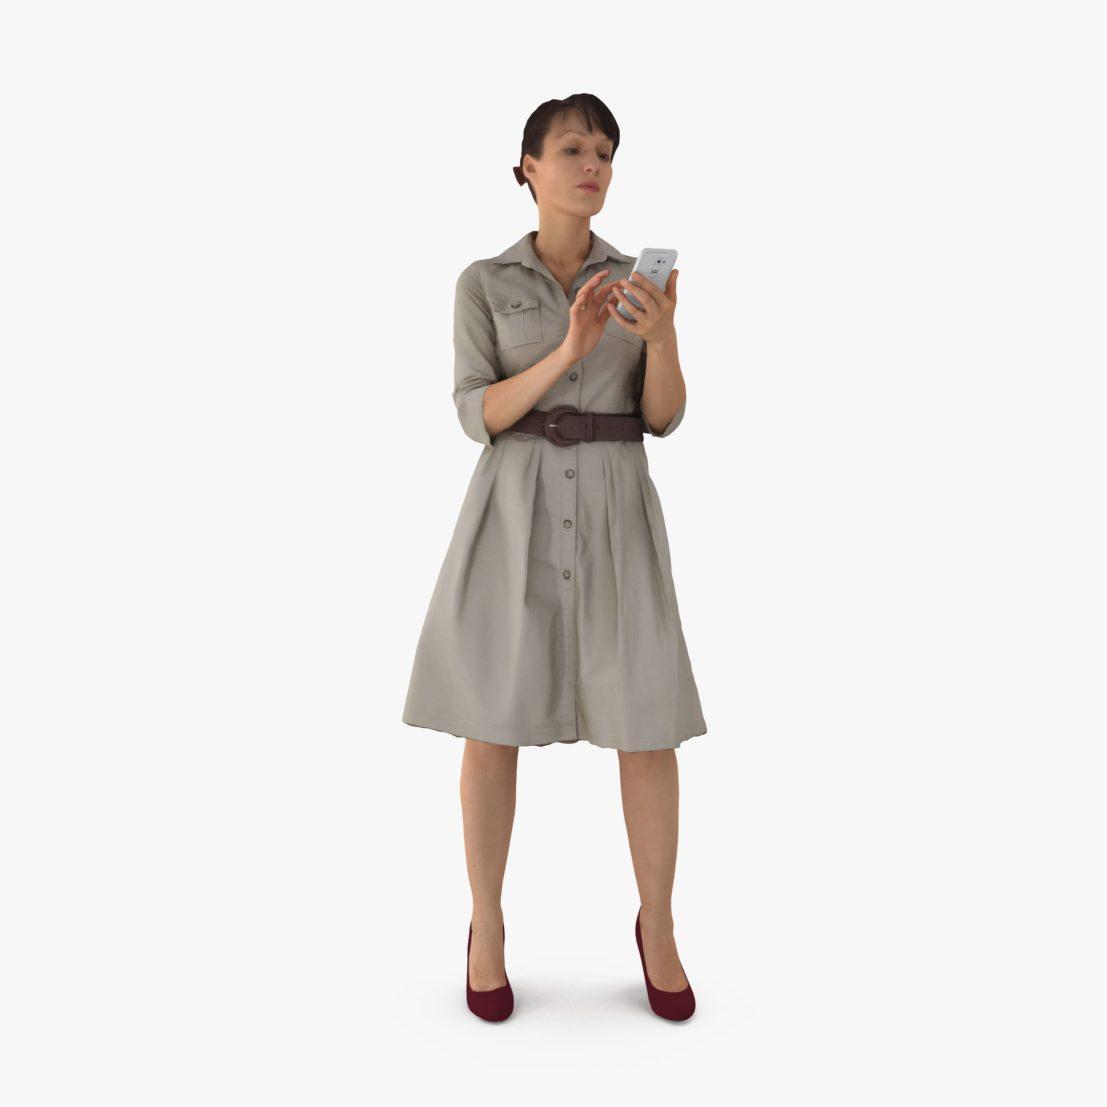 Business Lady in Dress 3D Model | 3DTree Scanning Studio